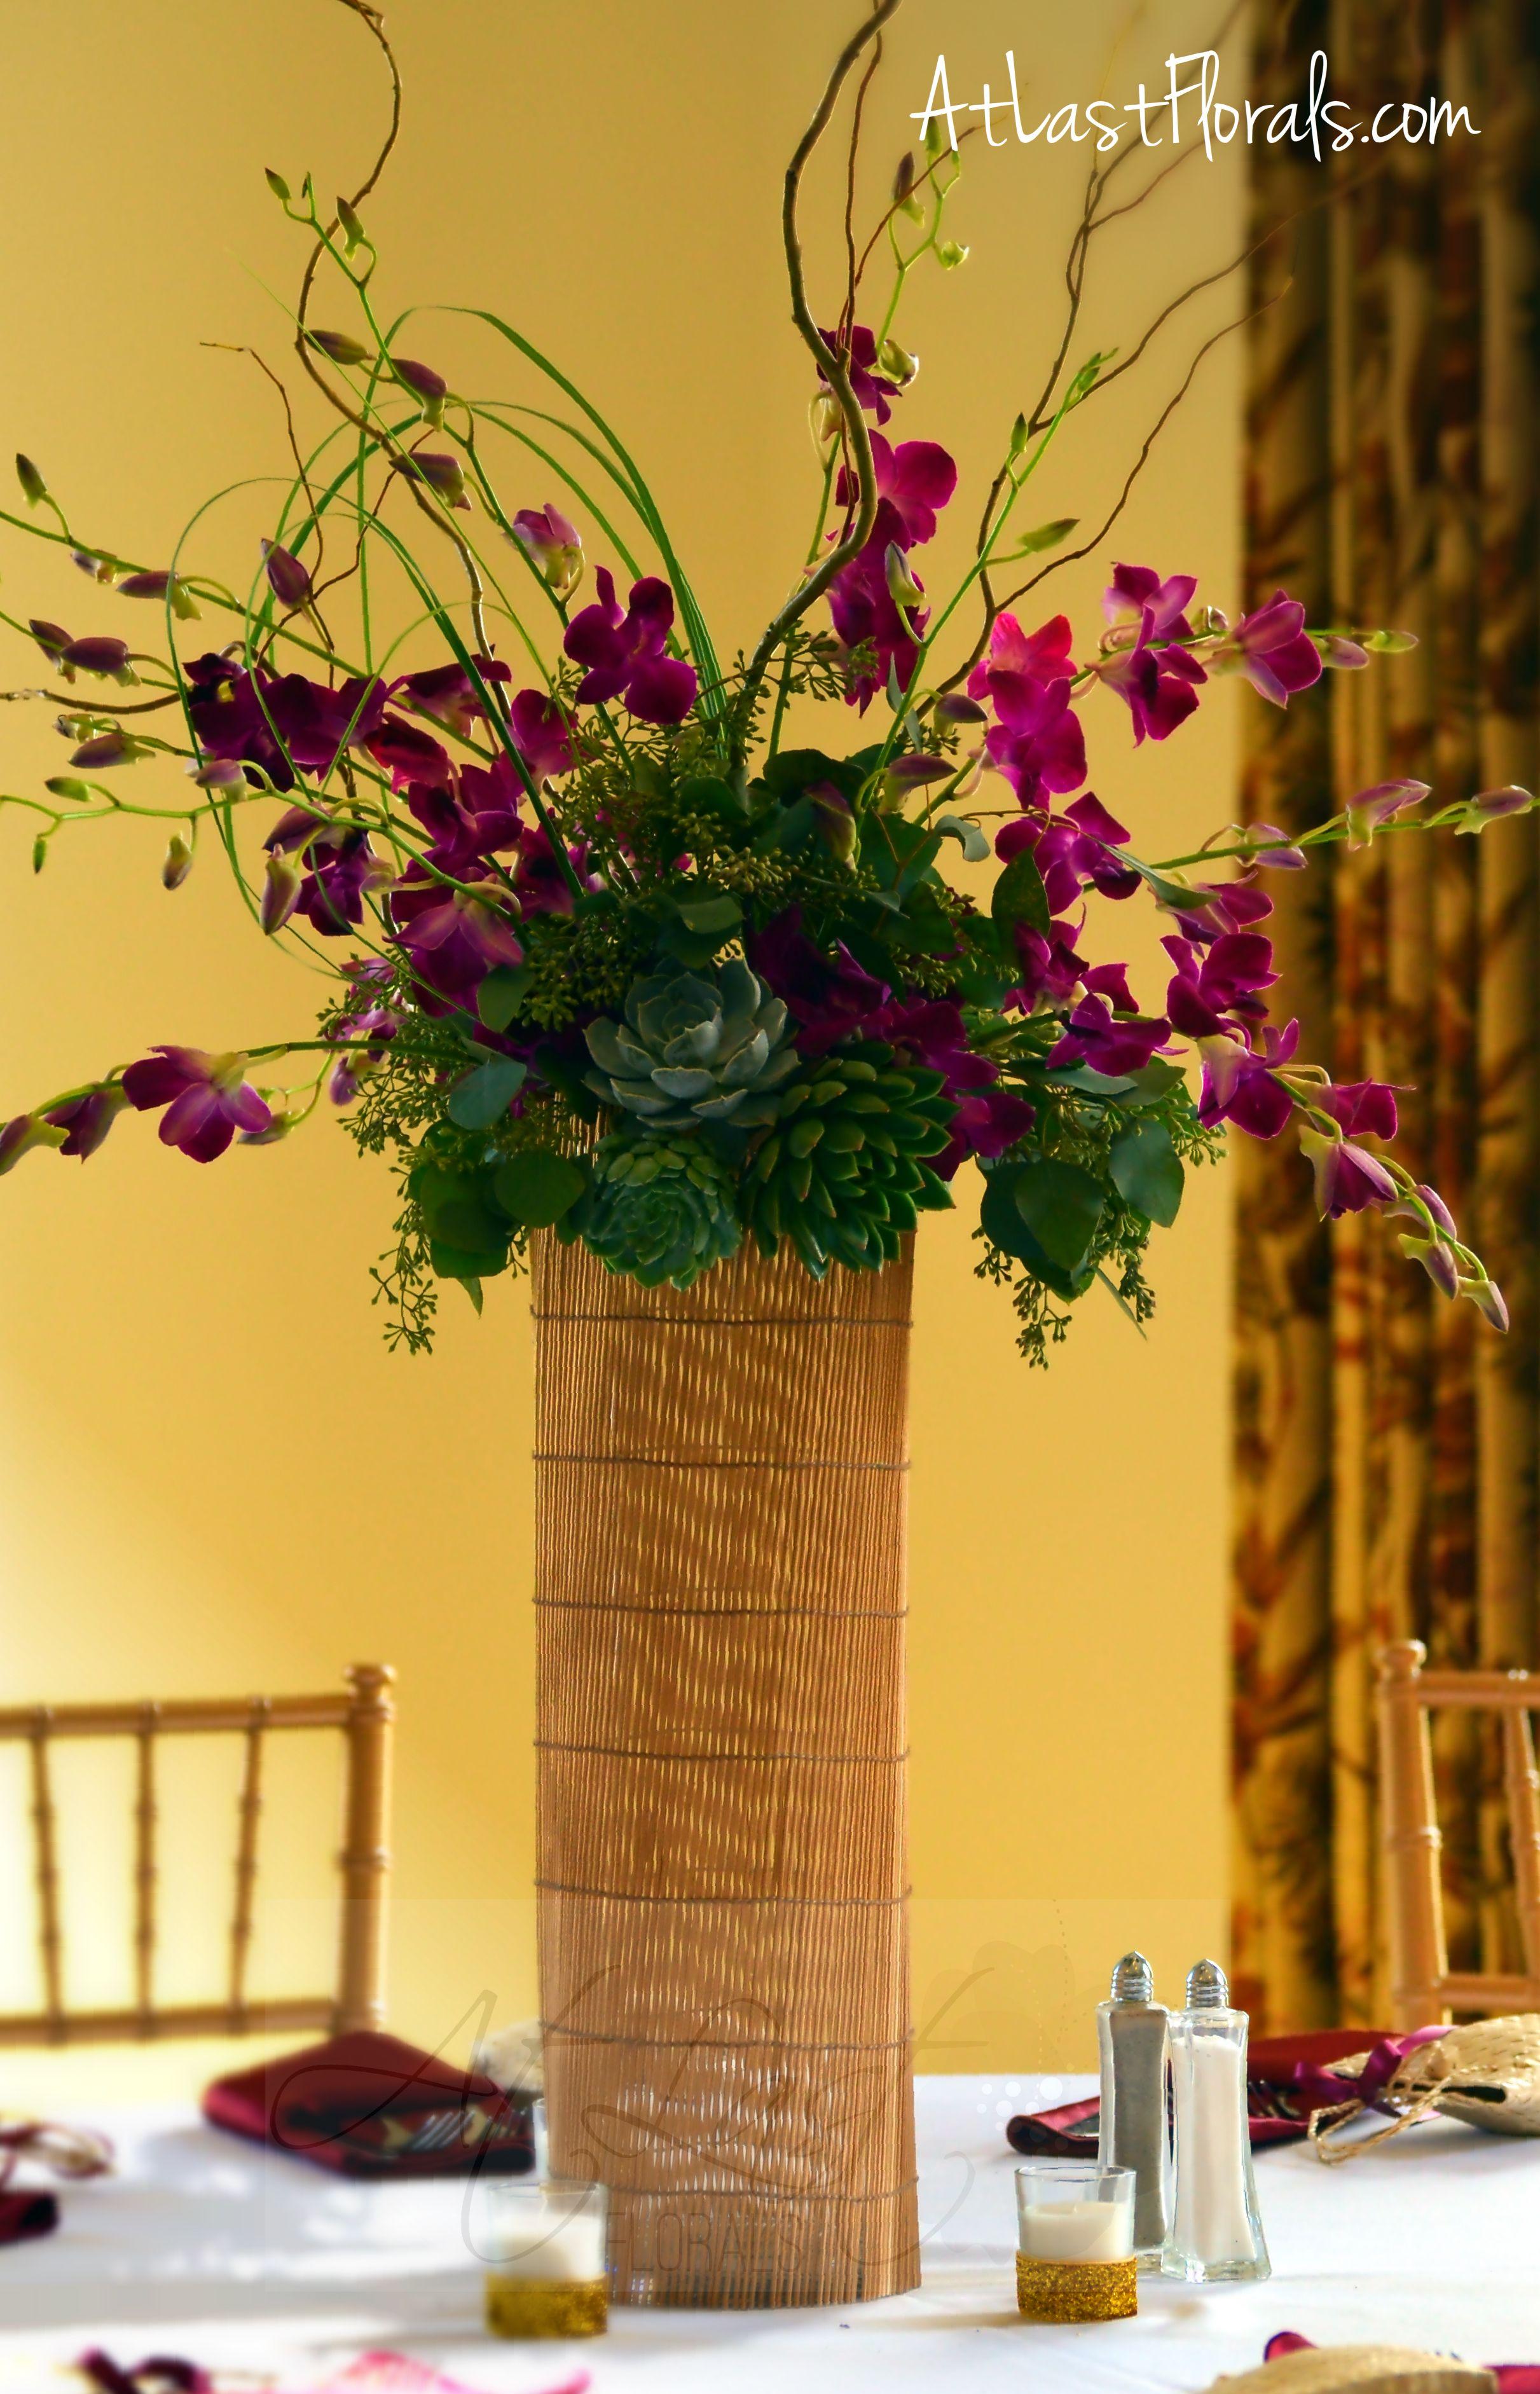 Unique centerpiece modern flowers purple orchids and succulents unique centerpiece modern flowers purple orchids and succulents with bamboo accented vase tall reviewsmspy